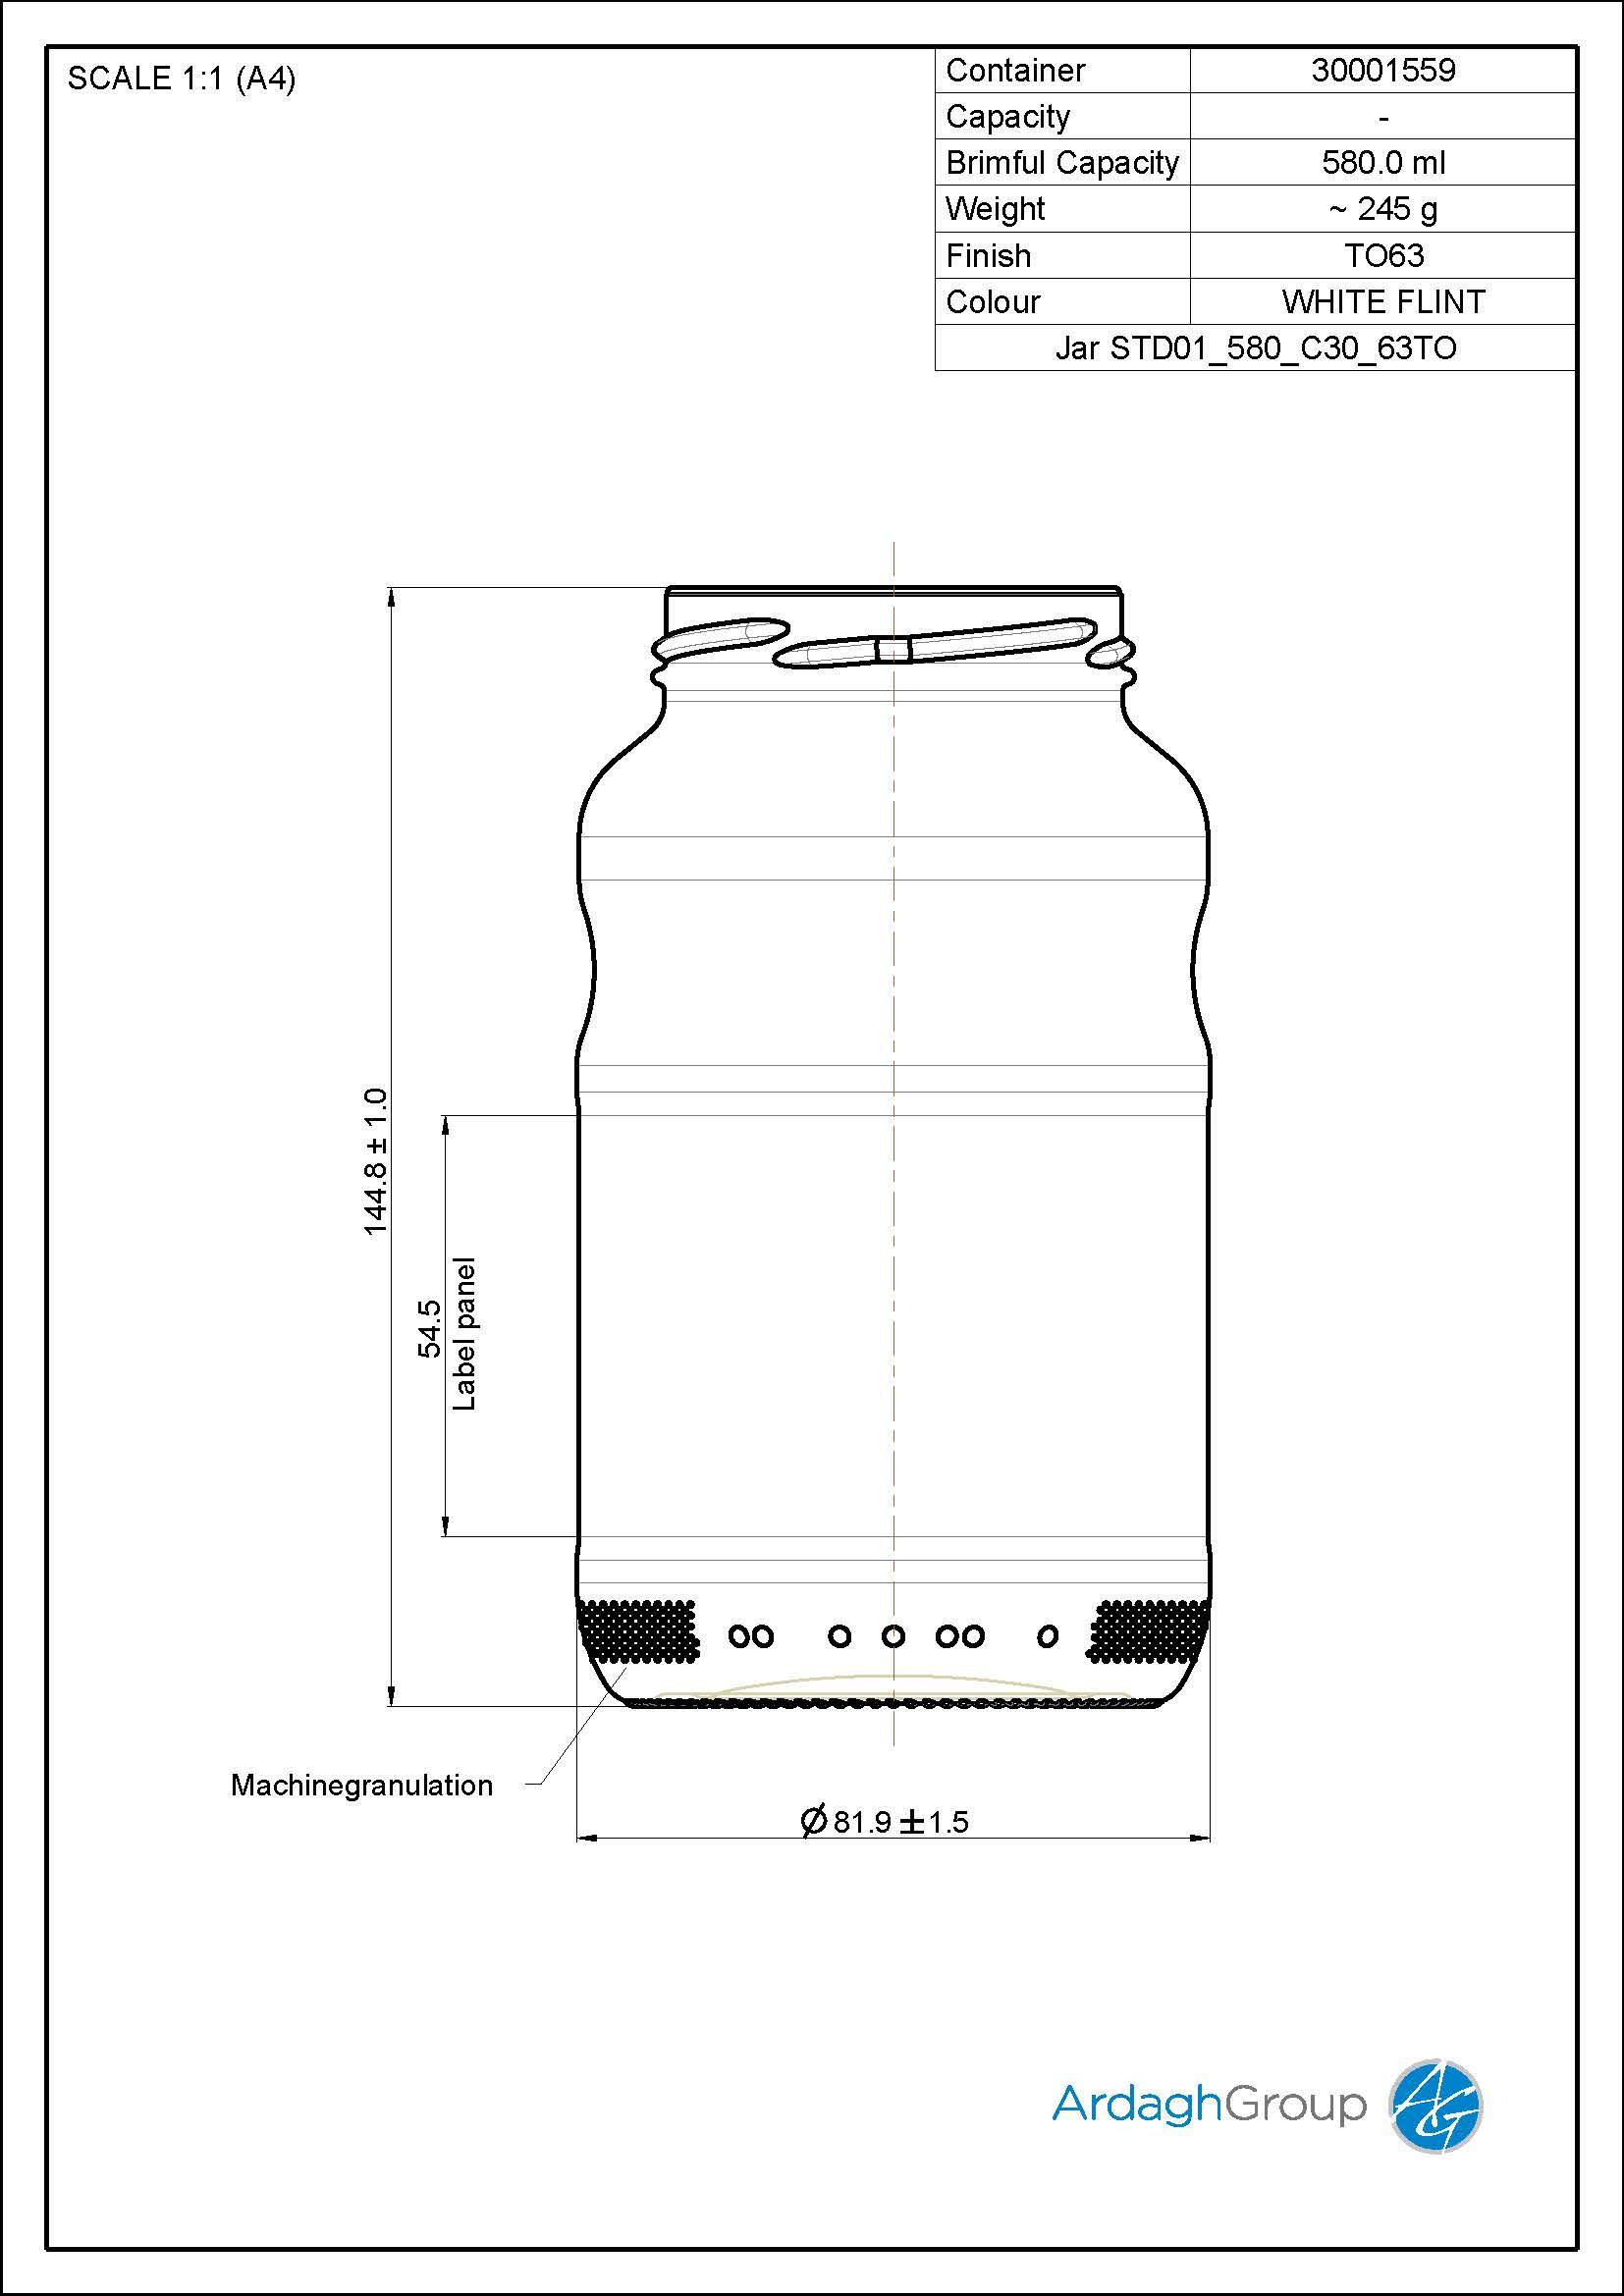 Jar STD01 580 C30 63TO